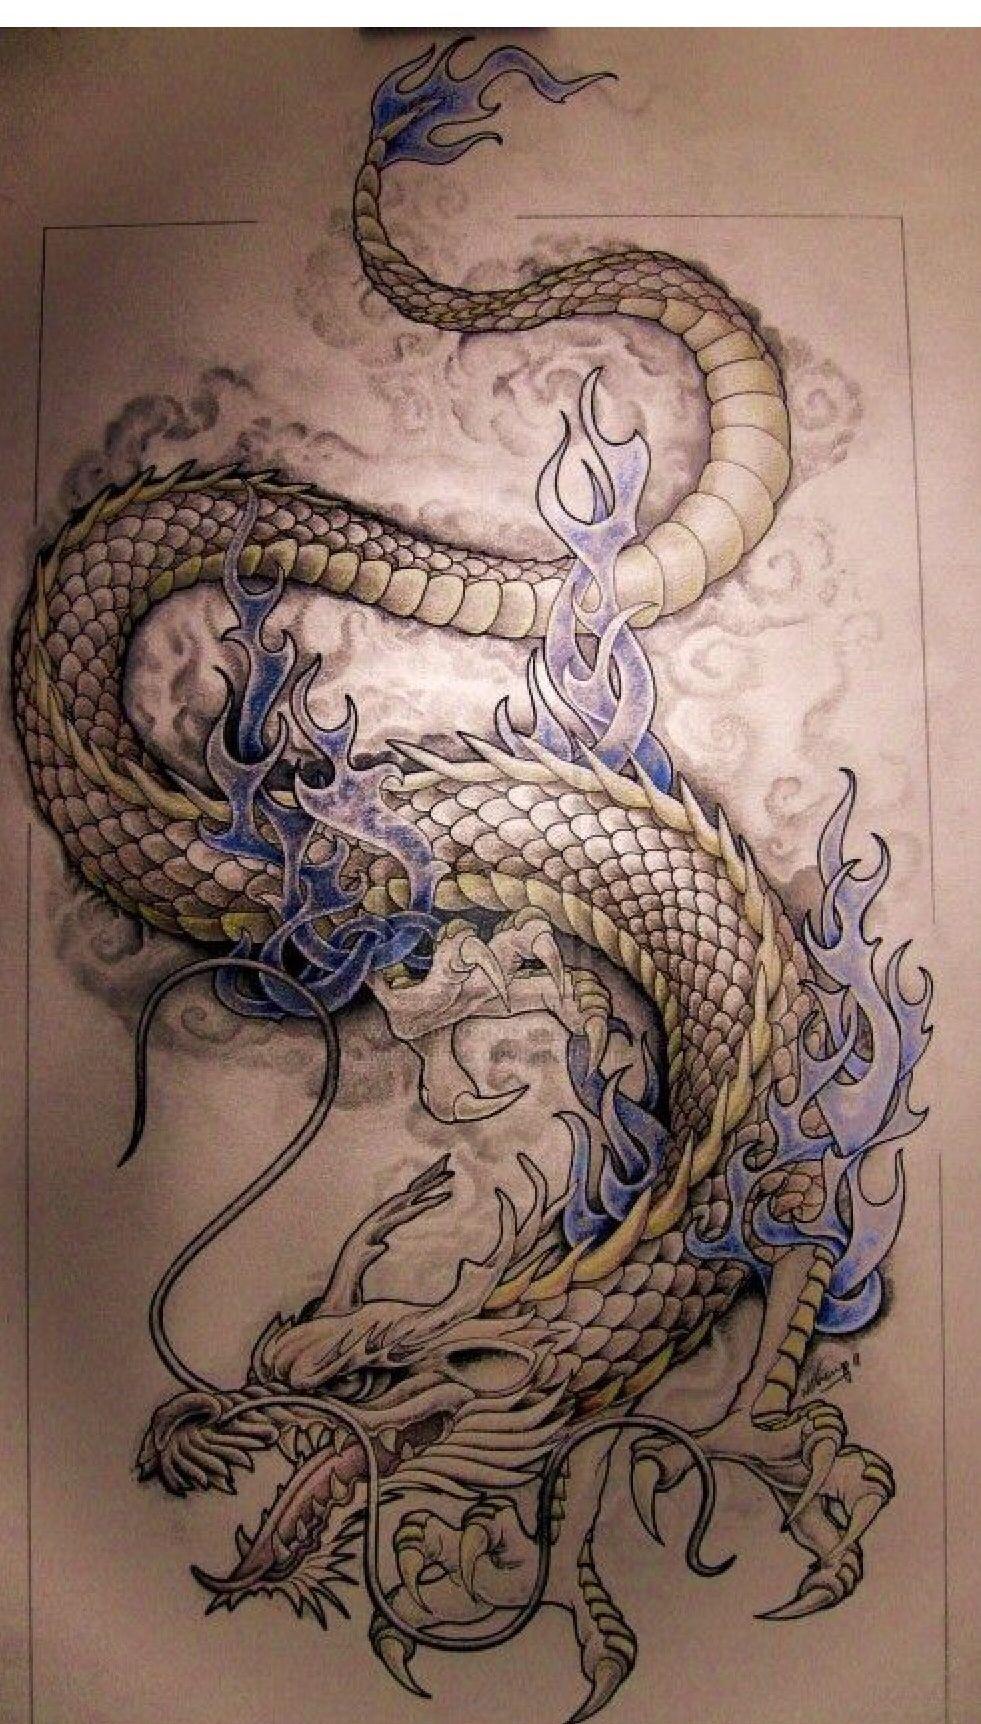 Dragon tattoo patterns by Rena Rivera Ryan on Dragons